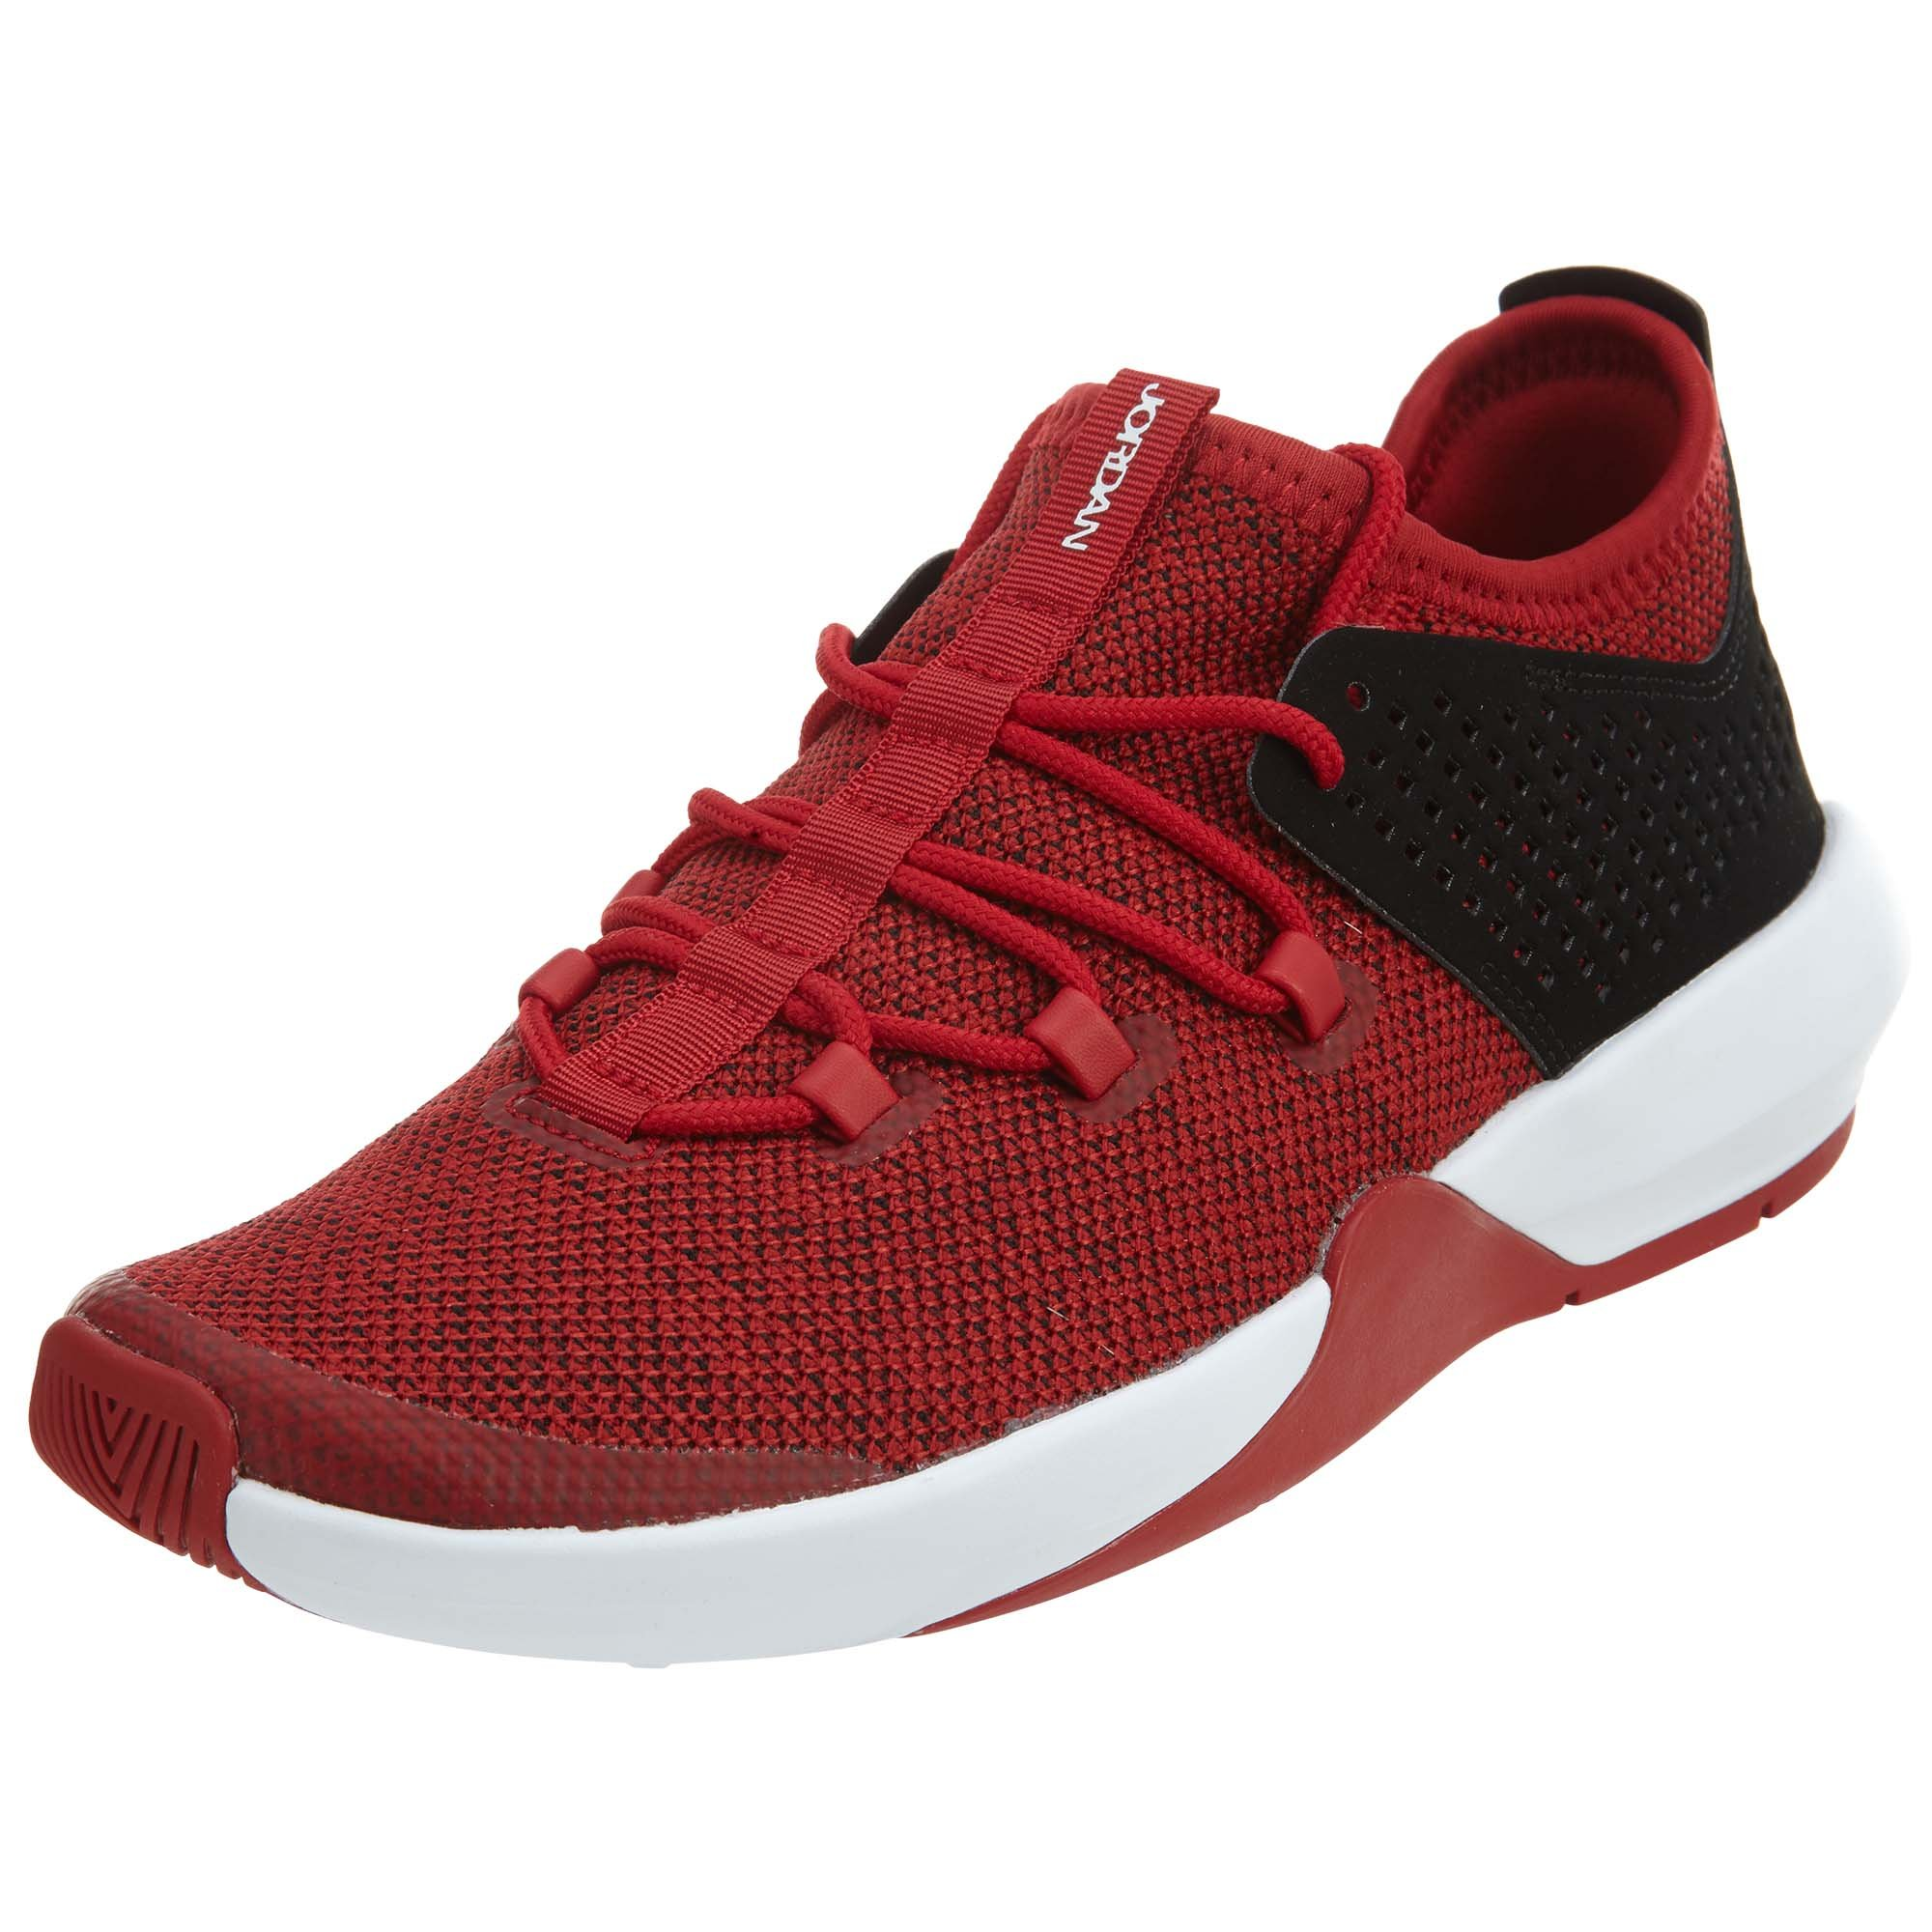 d97240620f82 Galleon - Nike Men s JORDAN EXPRESS Basketball Shoes 897988-601 Size 10 US